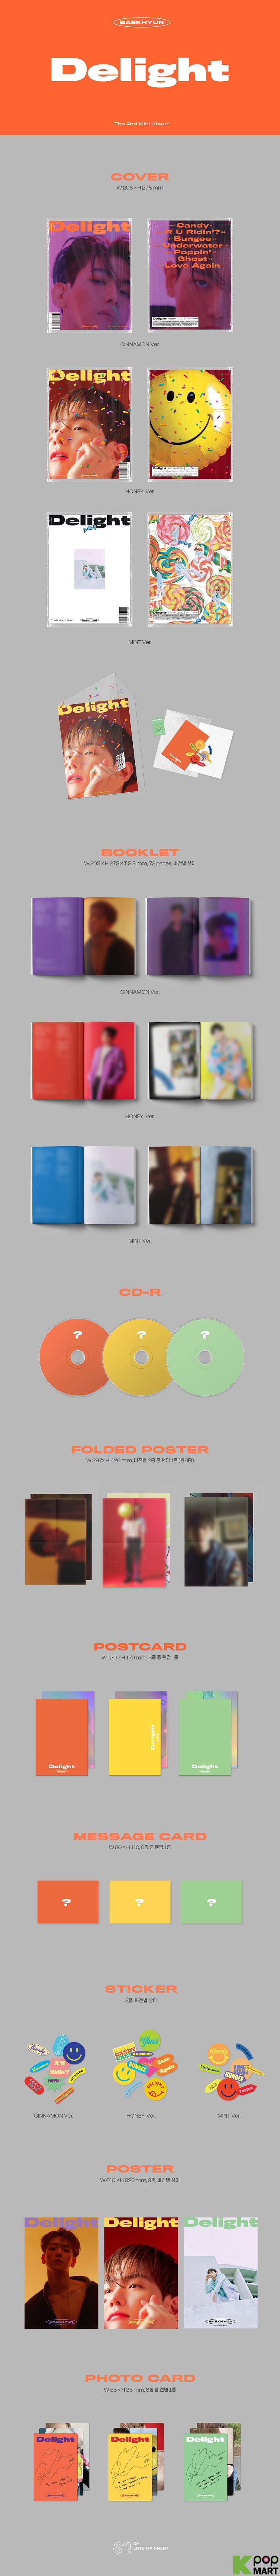 Baek Hyun Exo Mini Album Vol 2 Delight Random